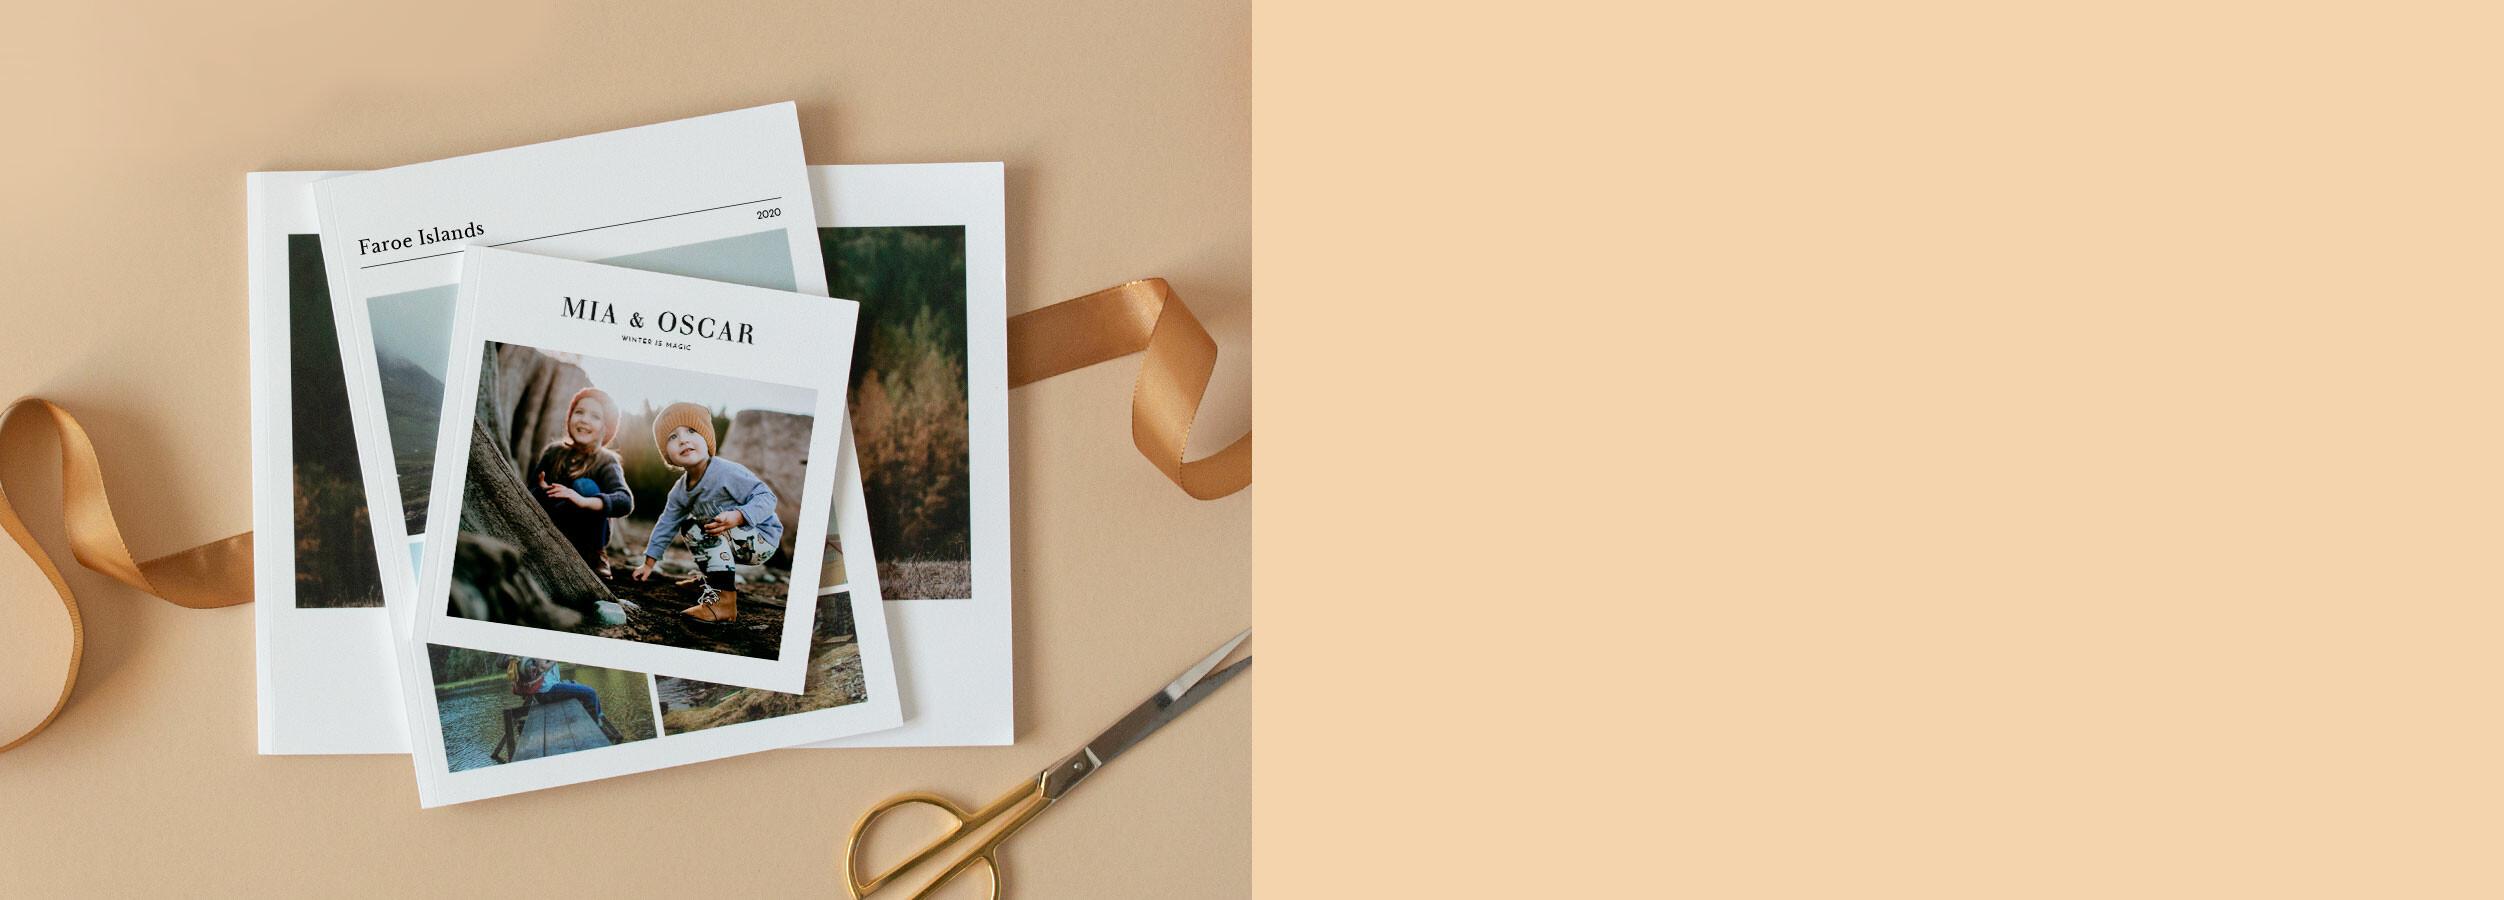 Rosemood平装照片书